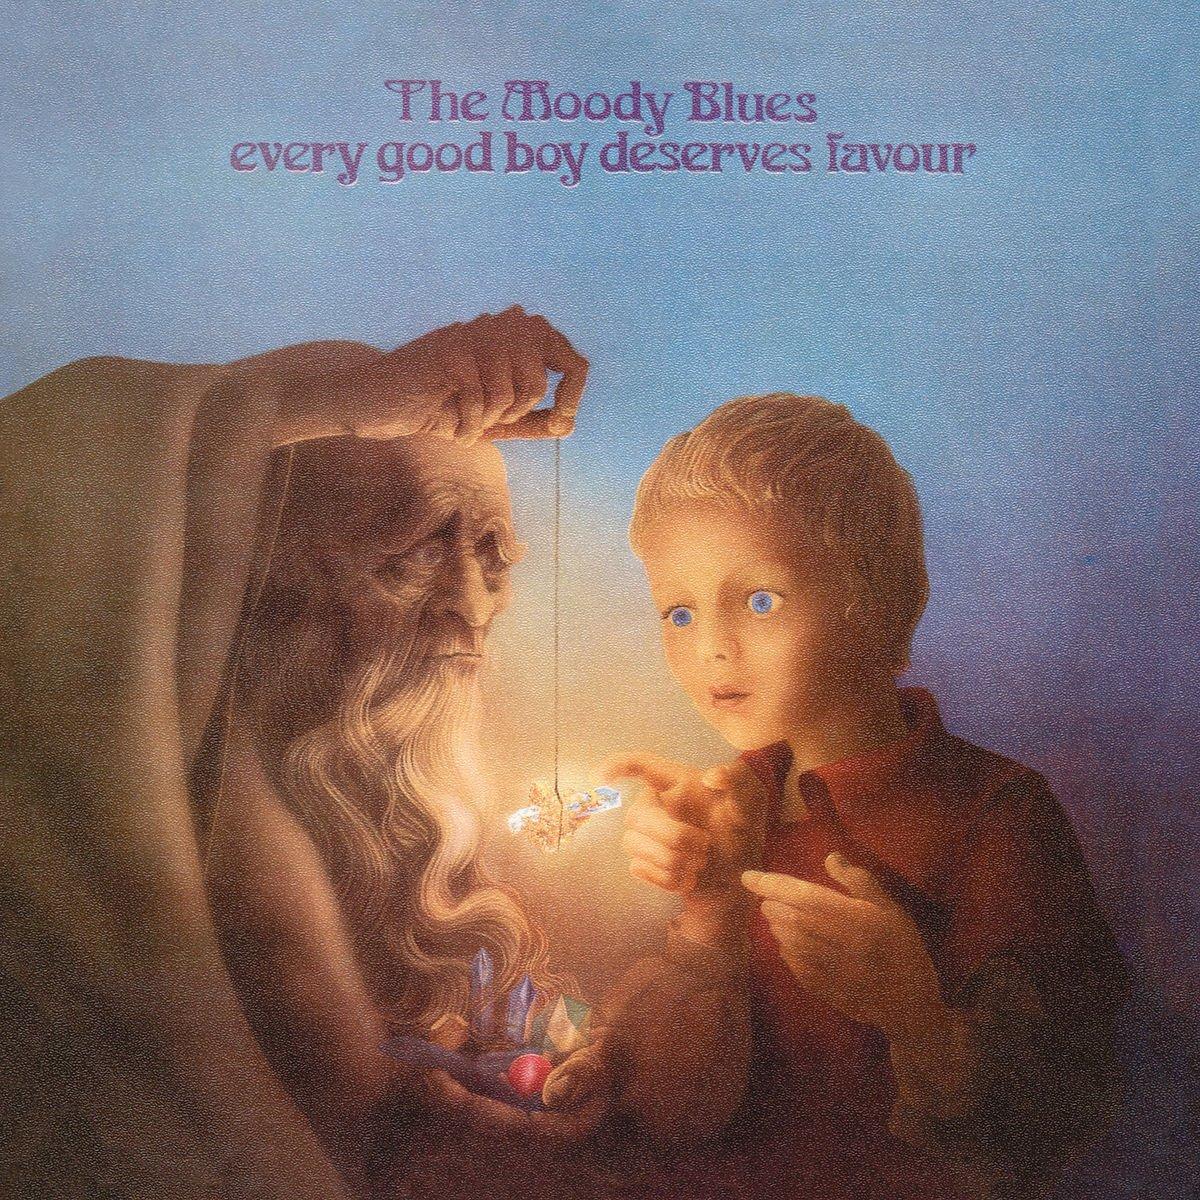 Vinilo : The Moody Blues - Every Good Boy Deserves Favour (LP Vinyl)